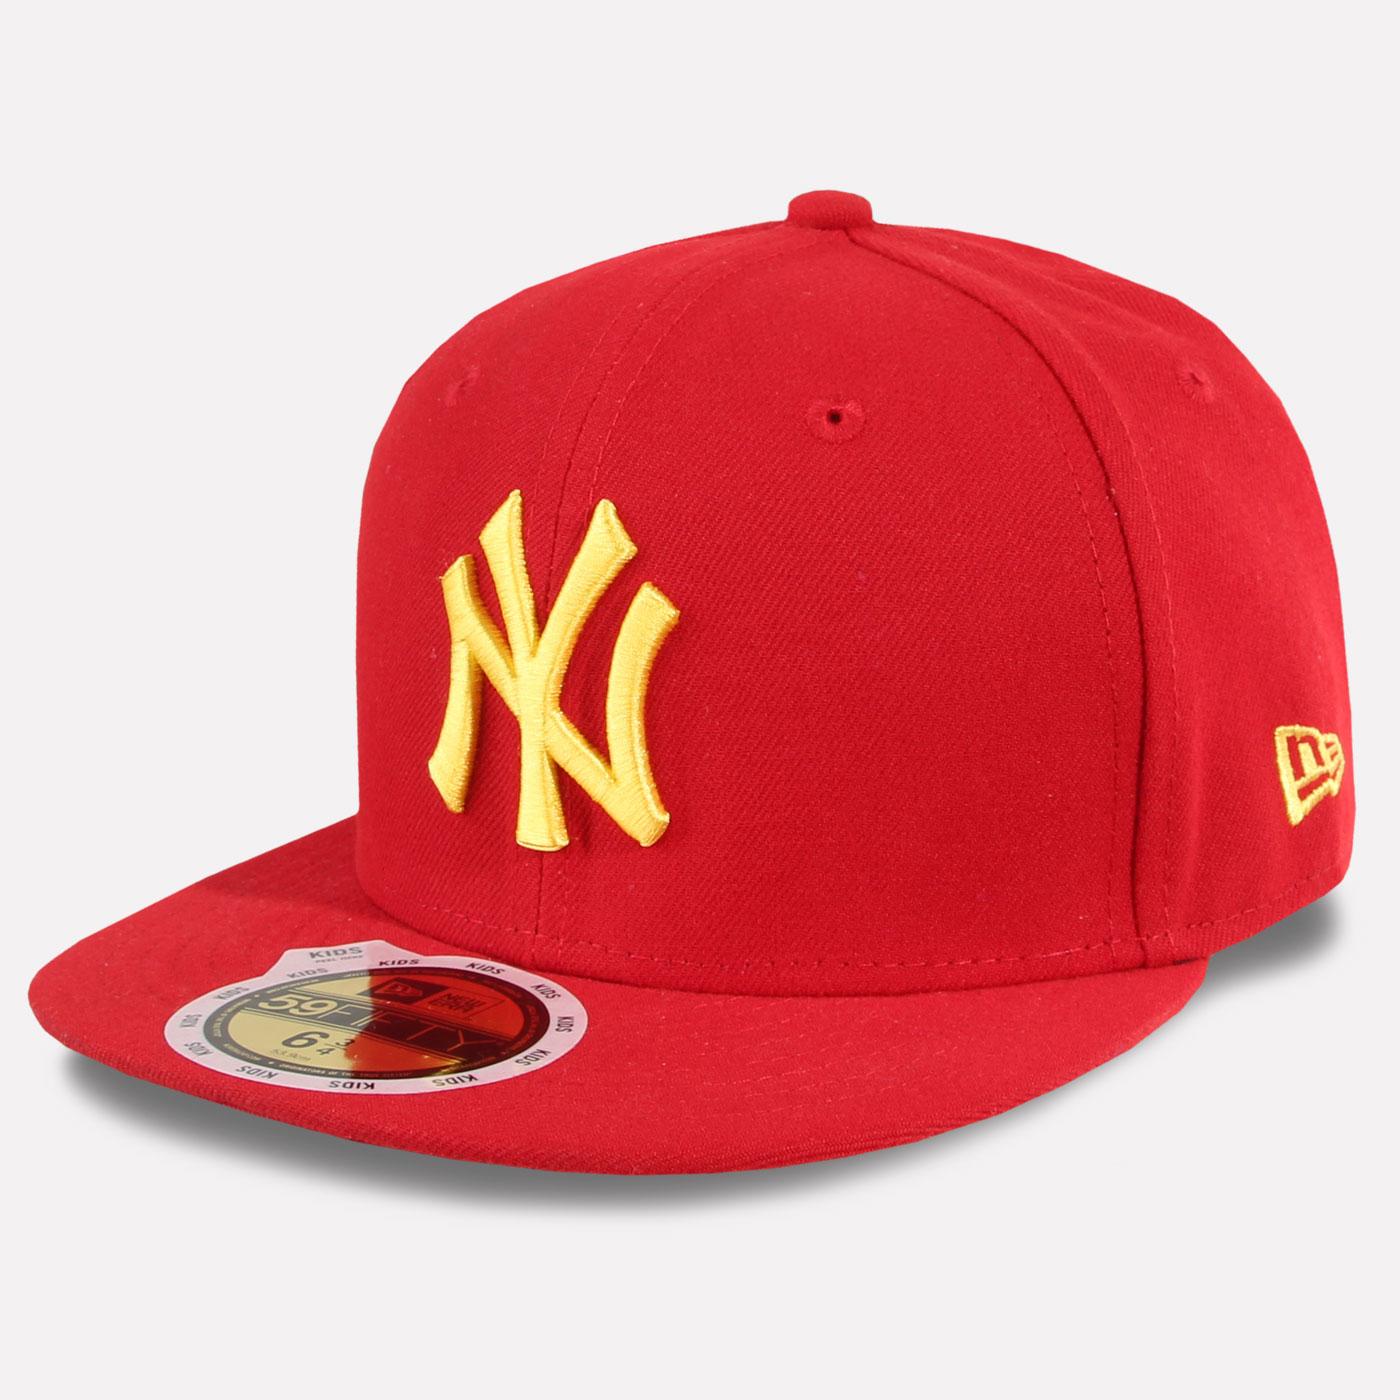 New era York Giganti NFL On Field Cap 5950 Authentic Fitted Berretto da Baseball